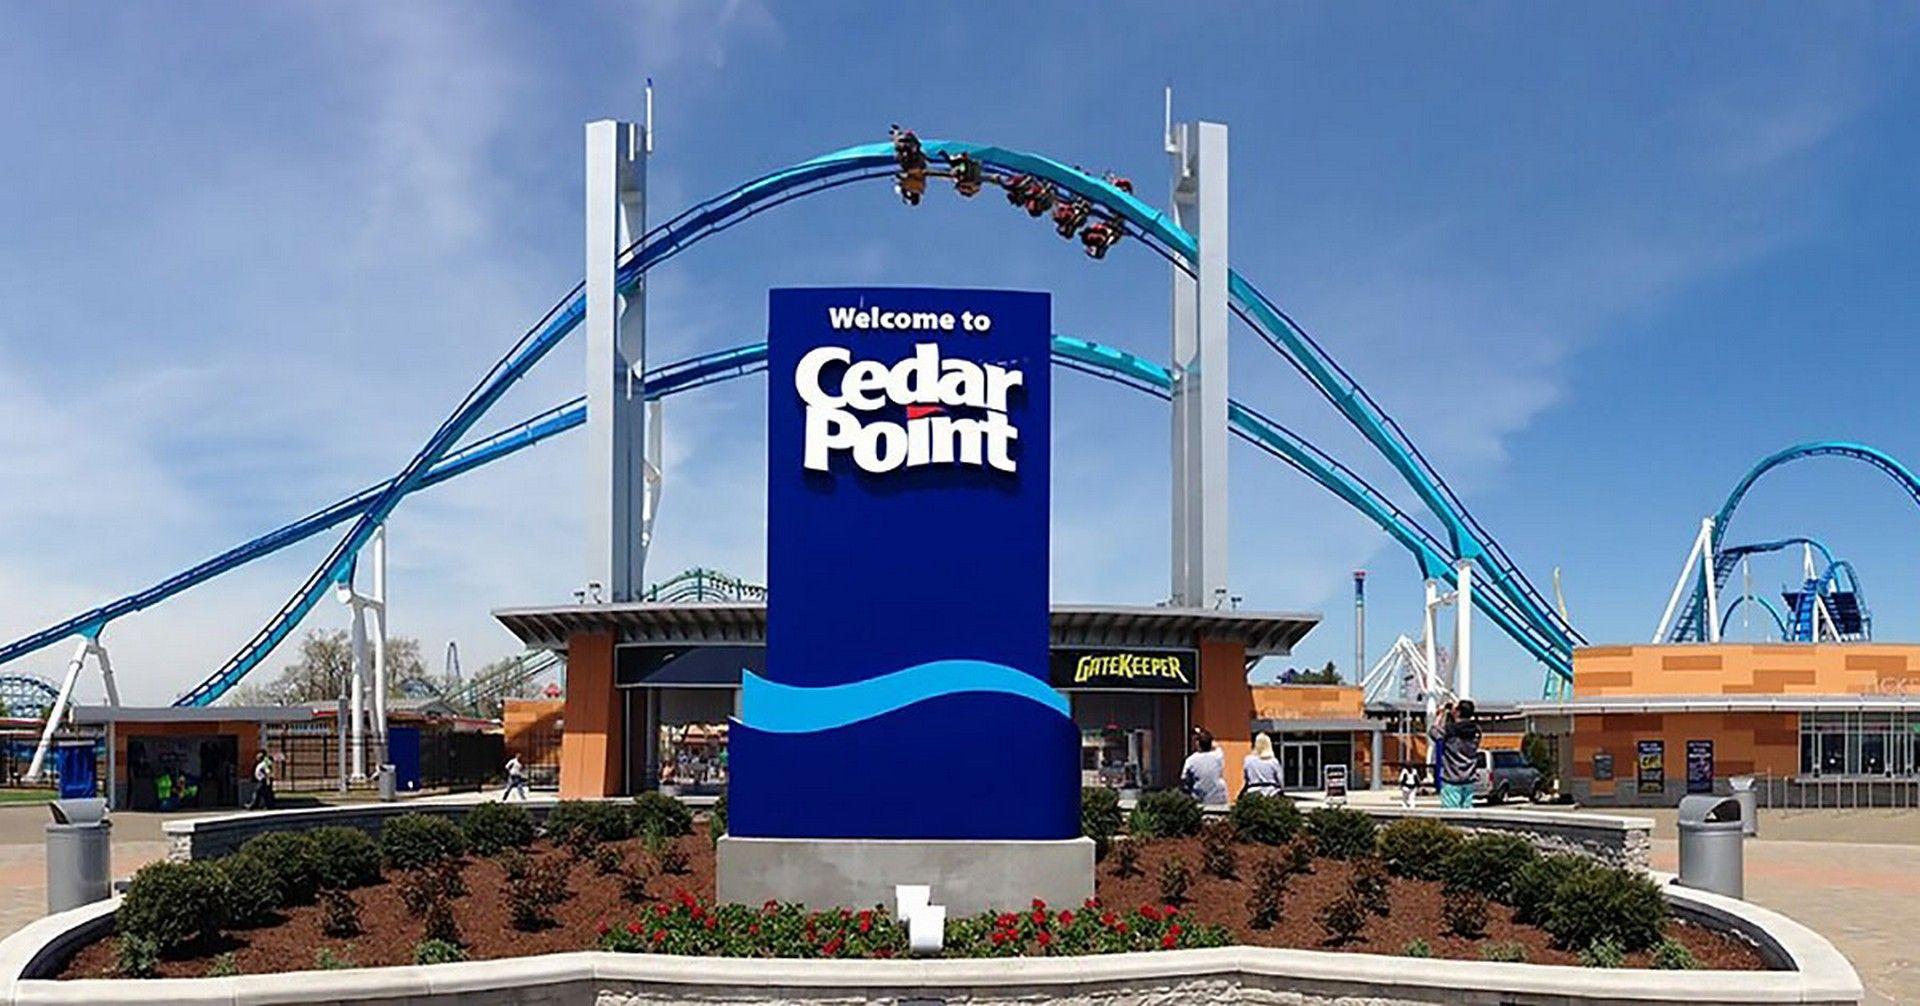 Hd Cedar Point Wallpaper Cedar Point Cedar Breathtaking Views